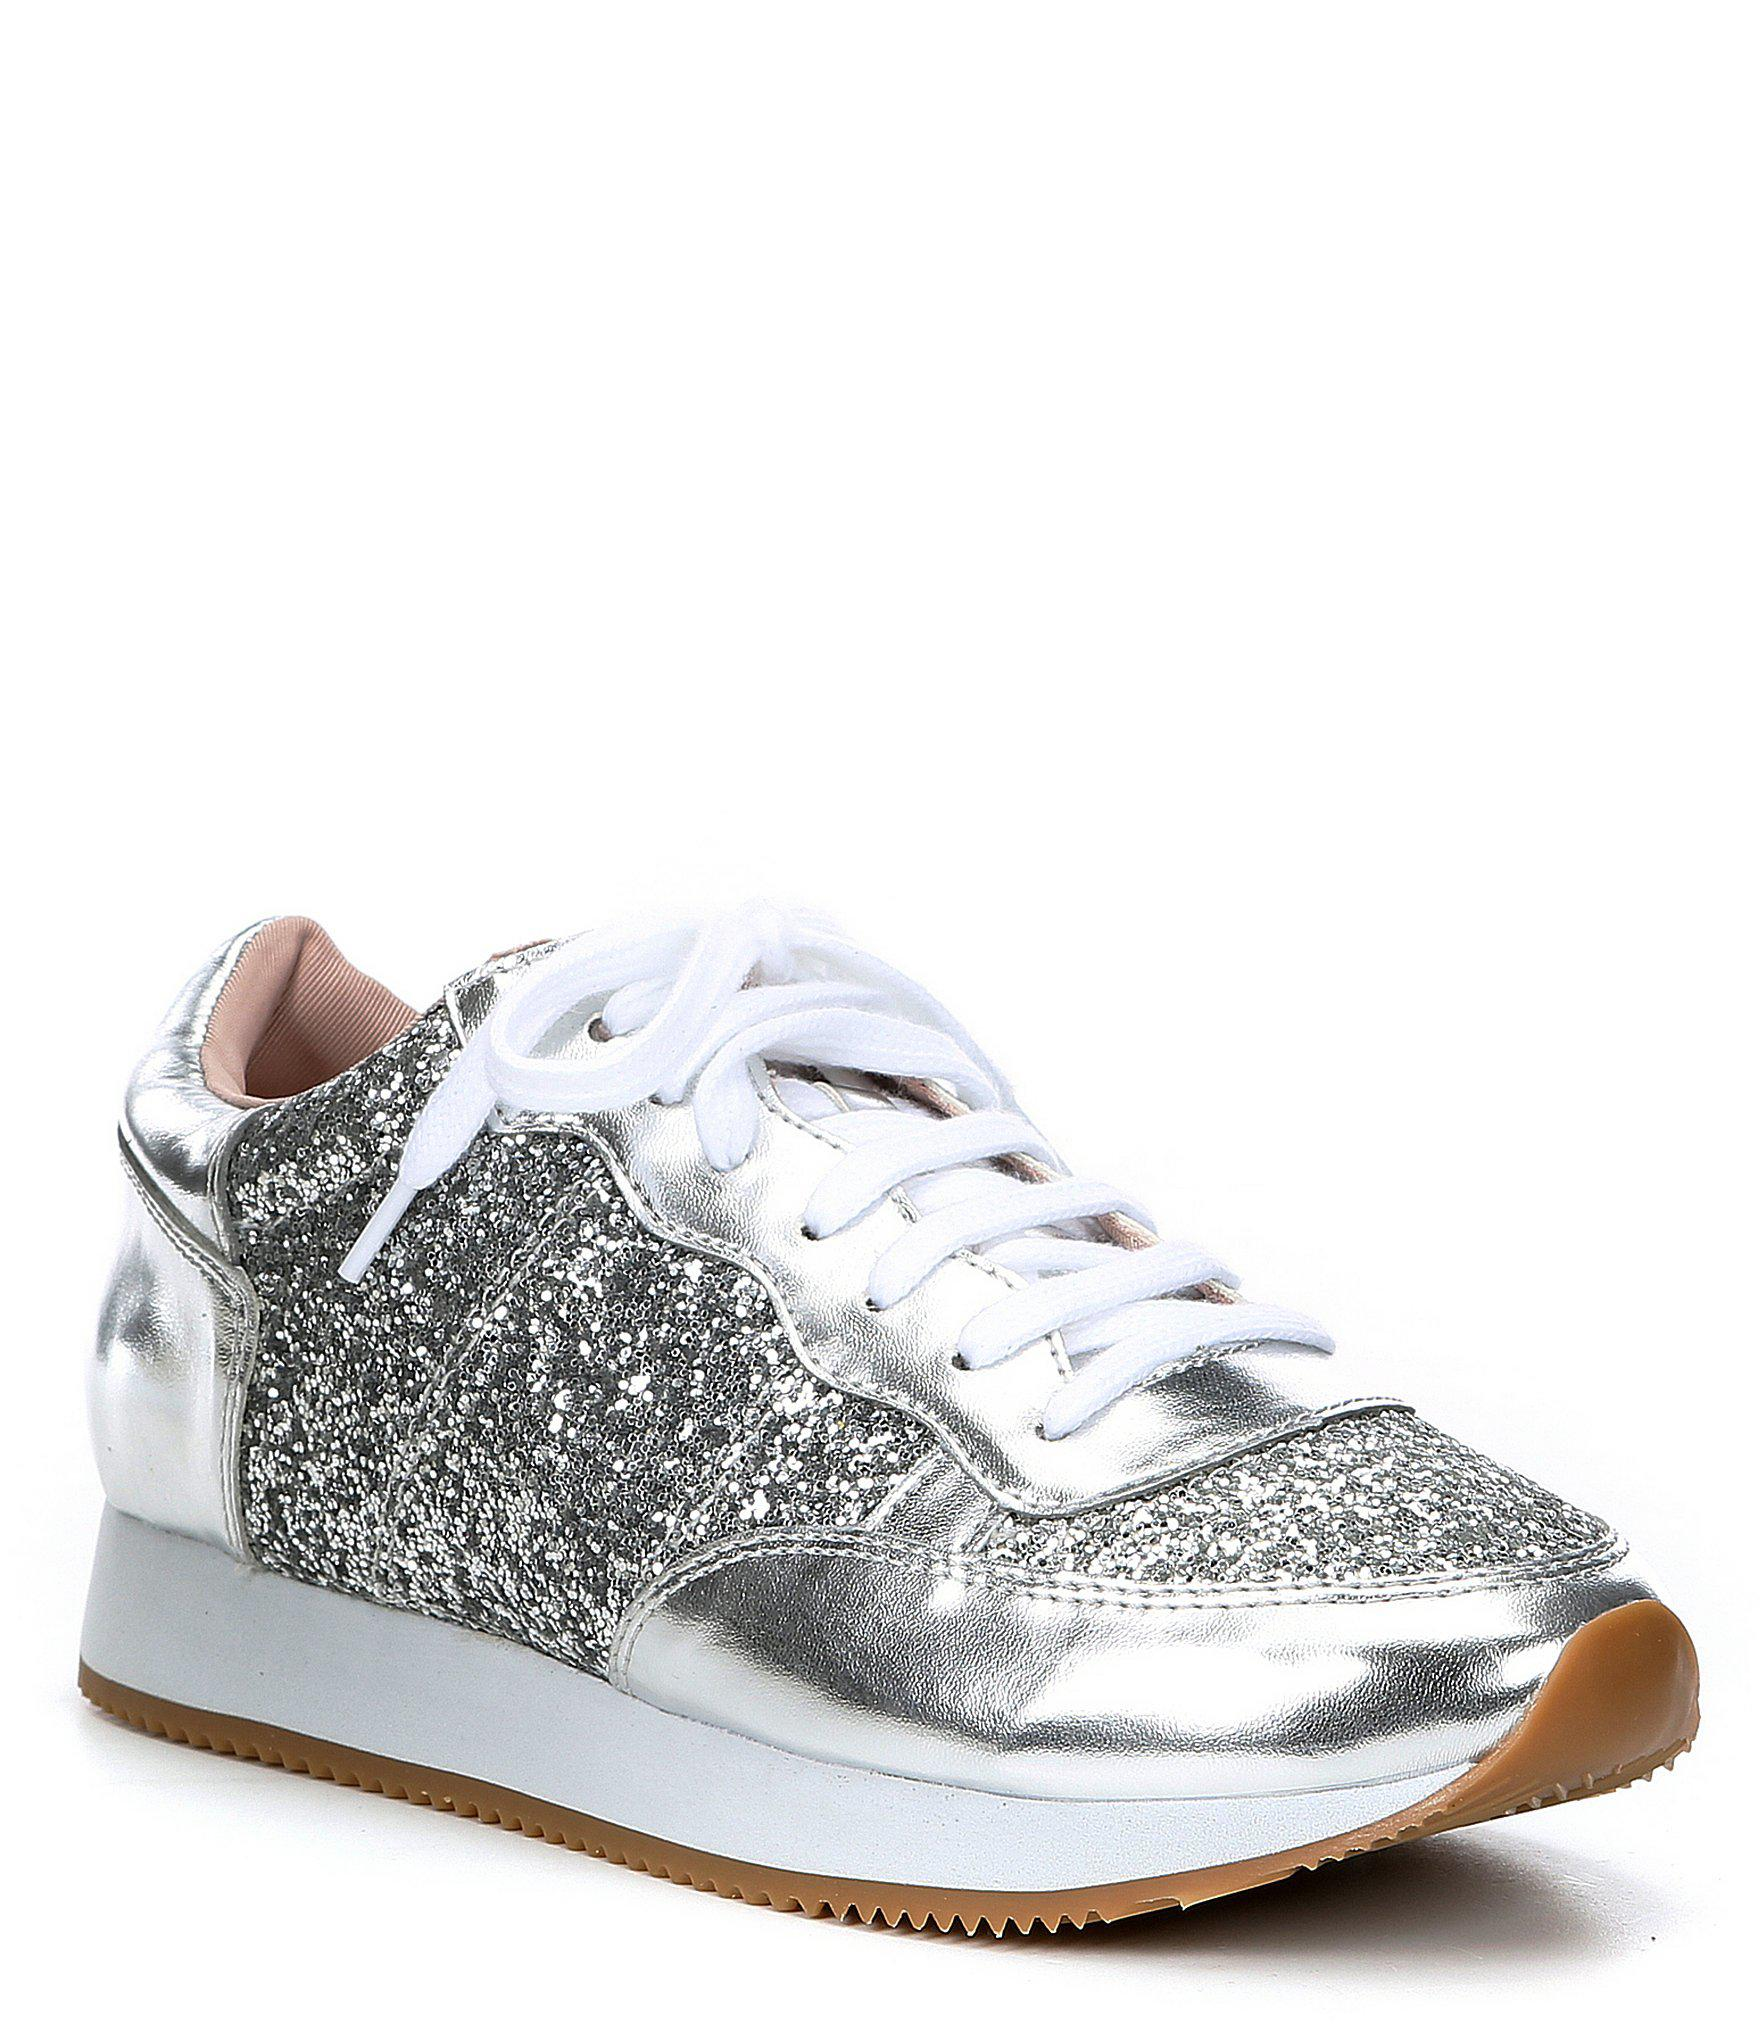 f8f6cd7734e Lyst - Kate Spade Felicia Walking Shoe in Metallic - Save 60%